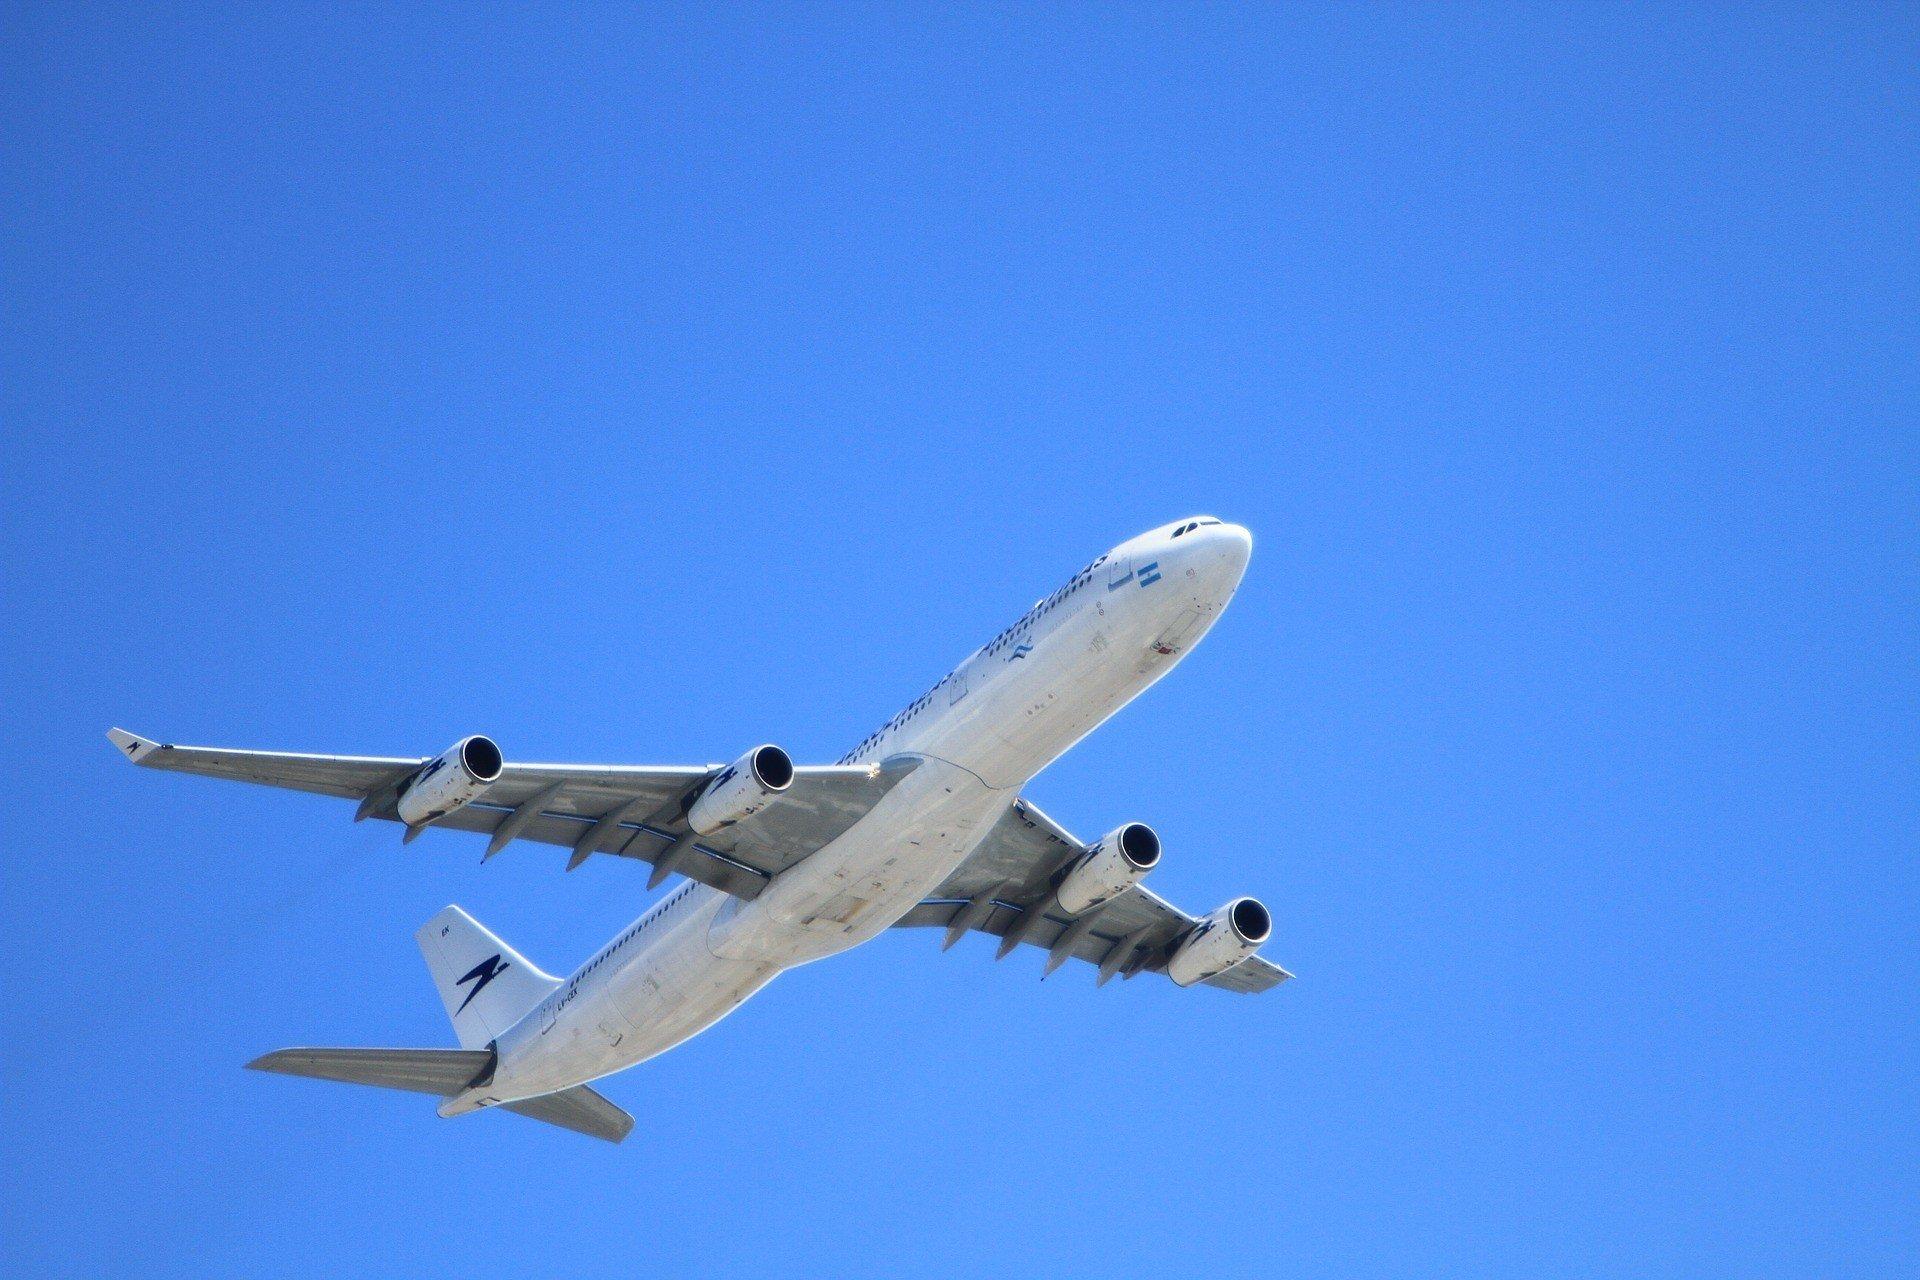 Авиастроители переходят на цифровые технологии